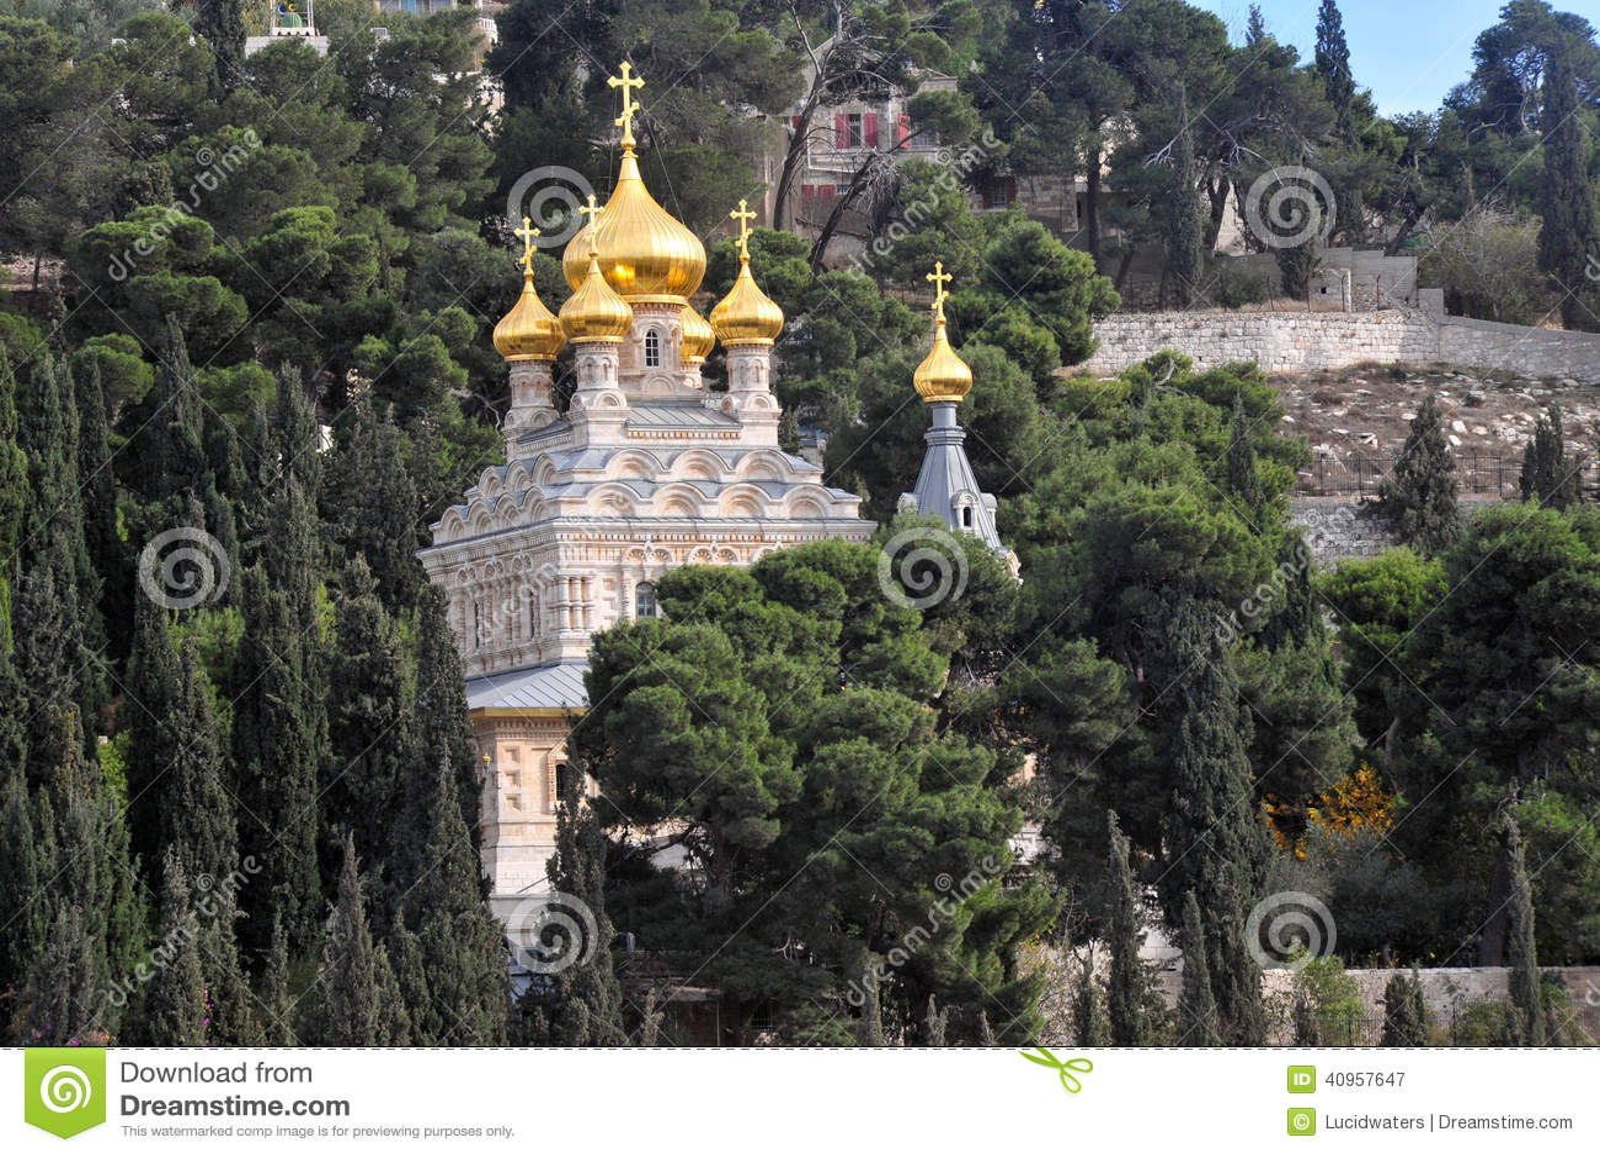 Kirche von Mary Magdalene im Ölberg in Jerusalem, Israel